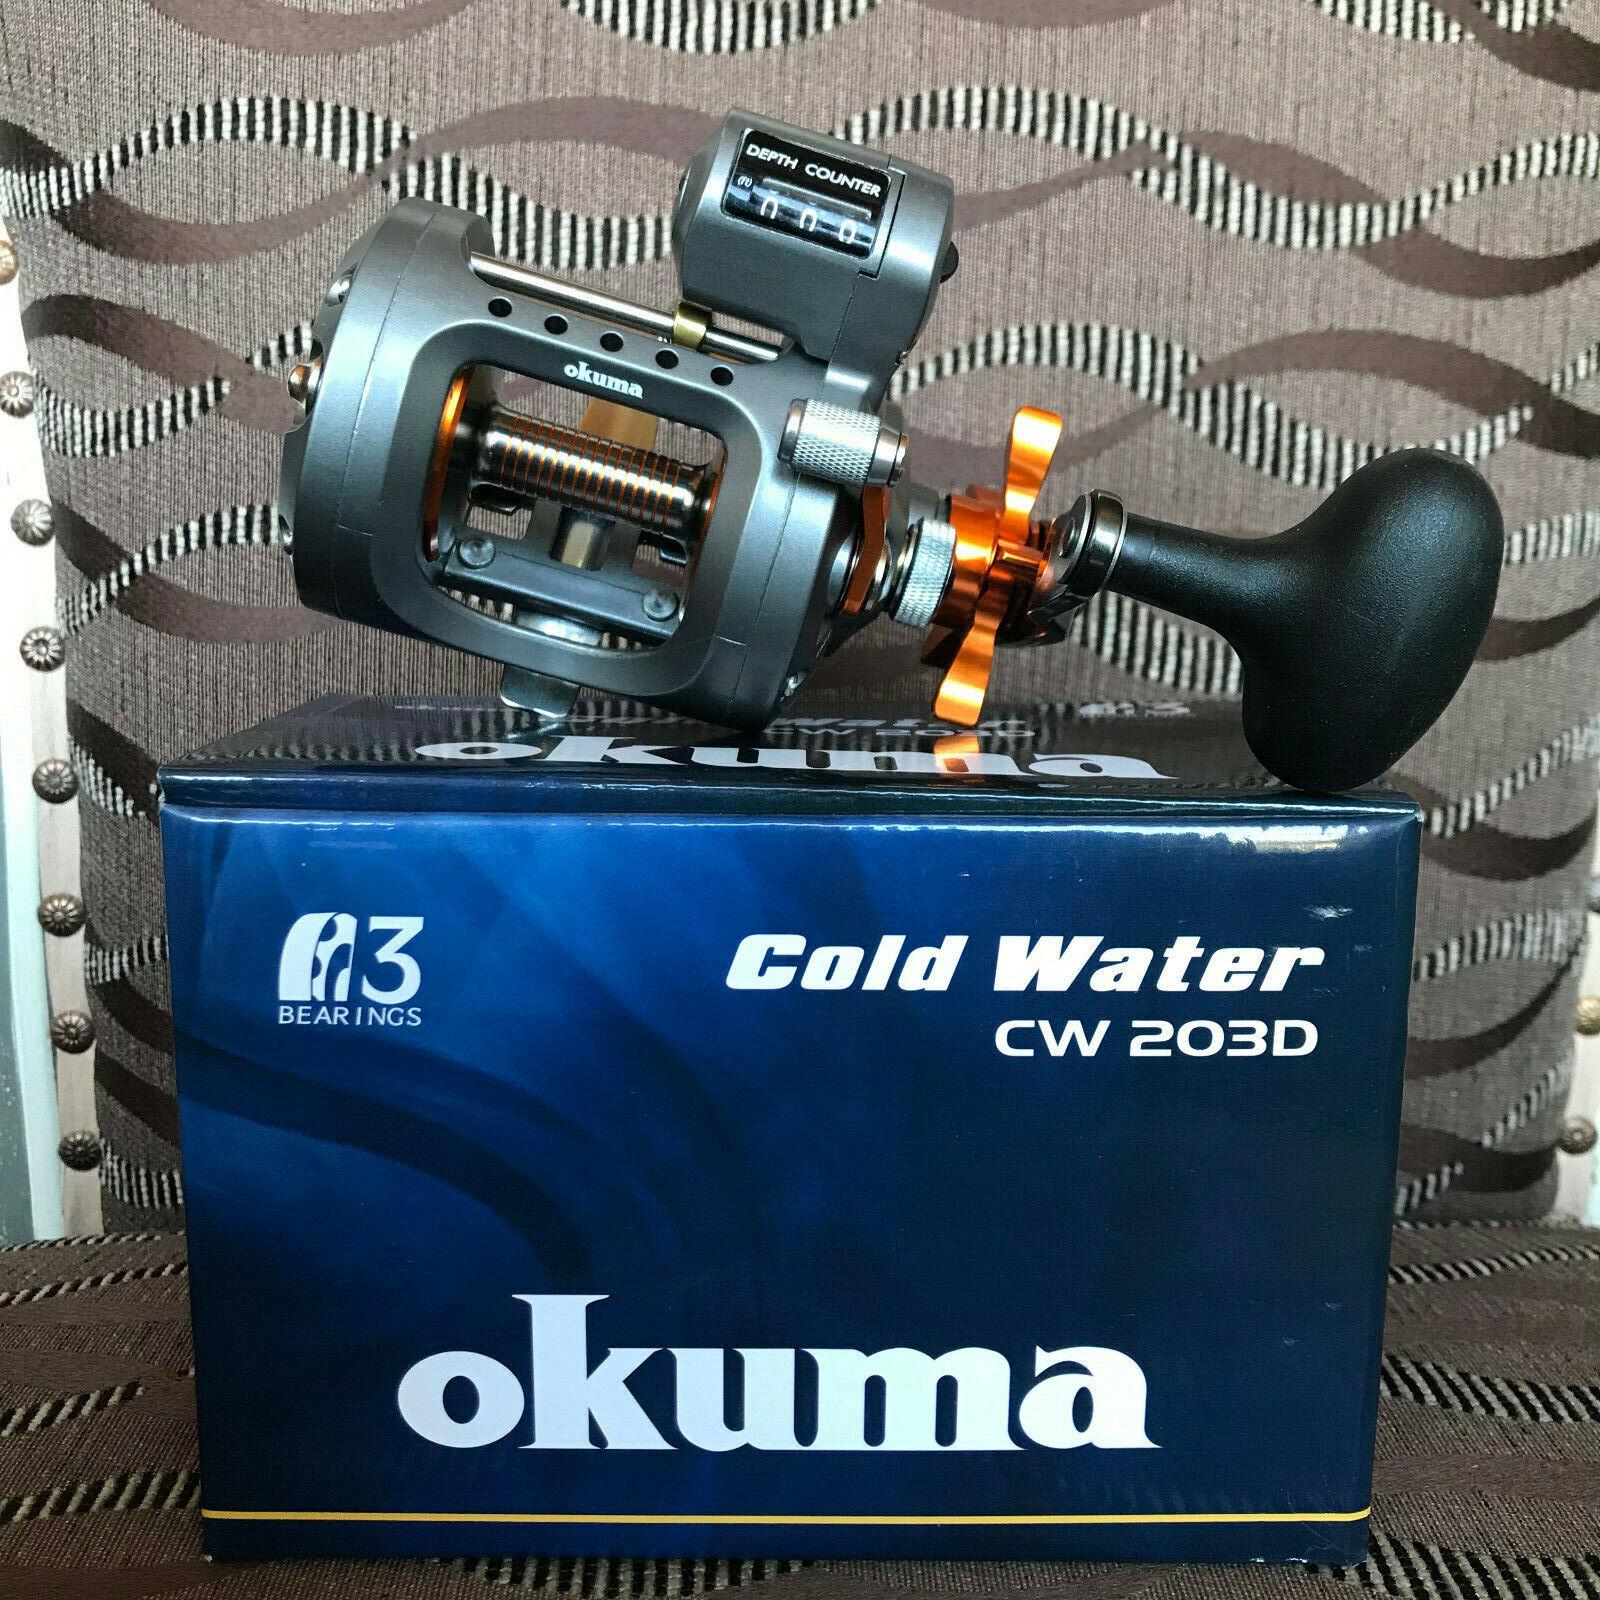 Okuma cold water cw-203d derecha mano Multi Rol